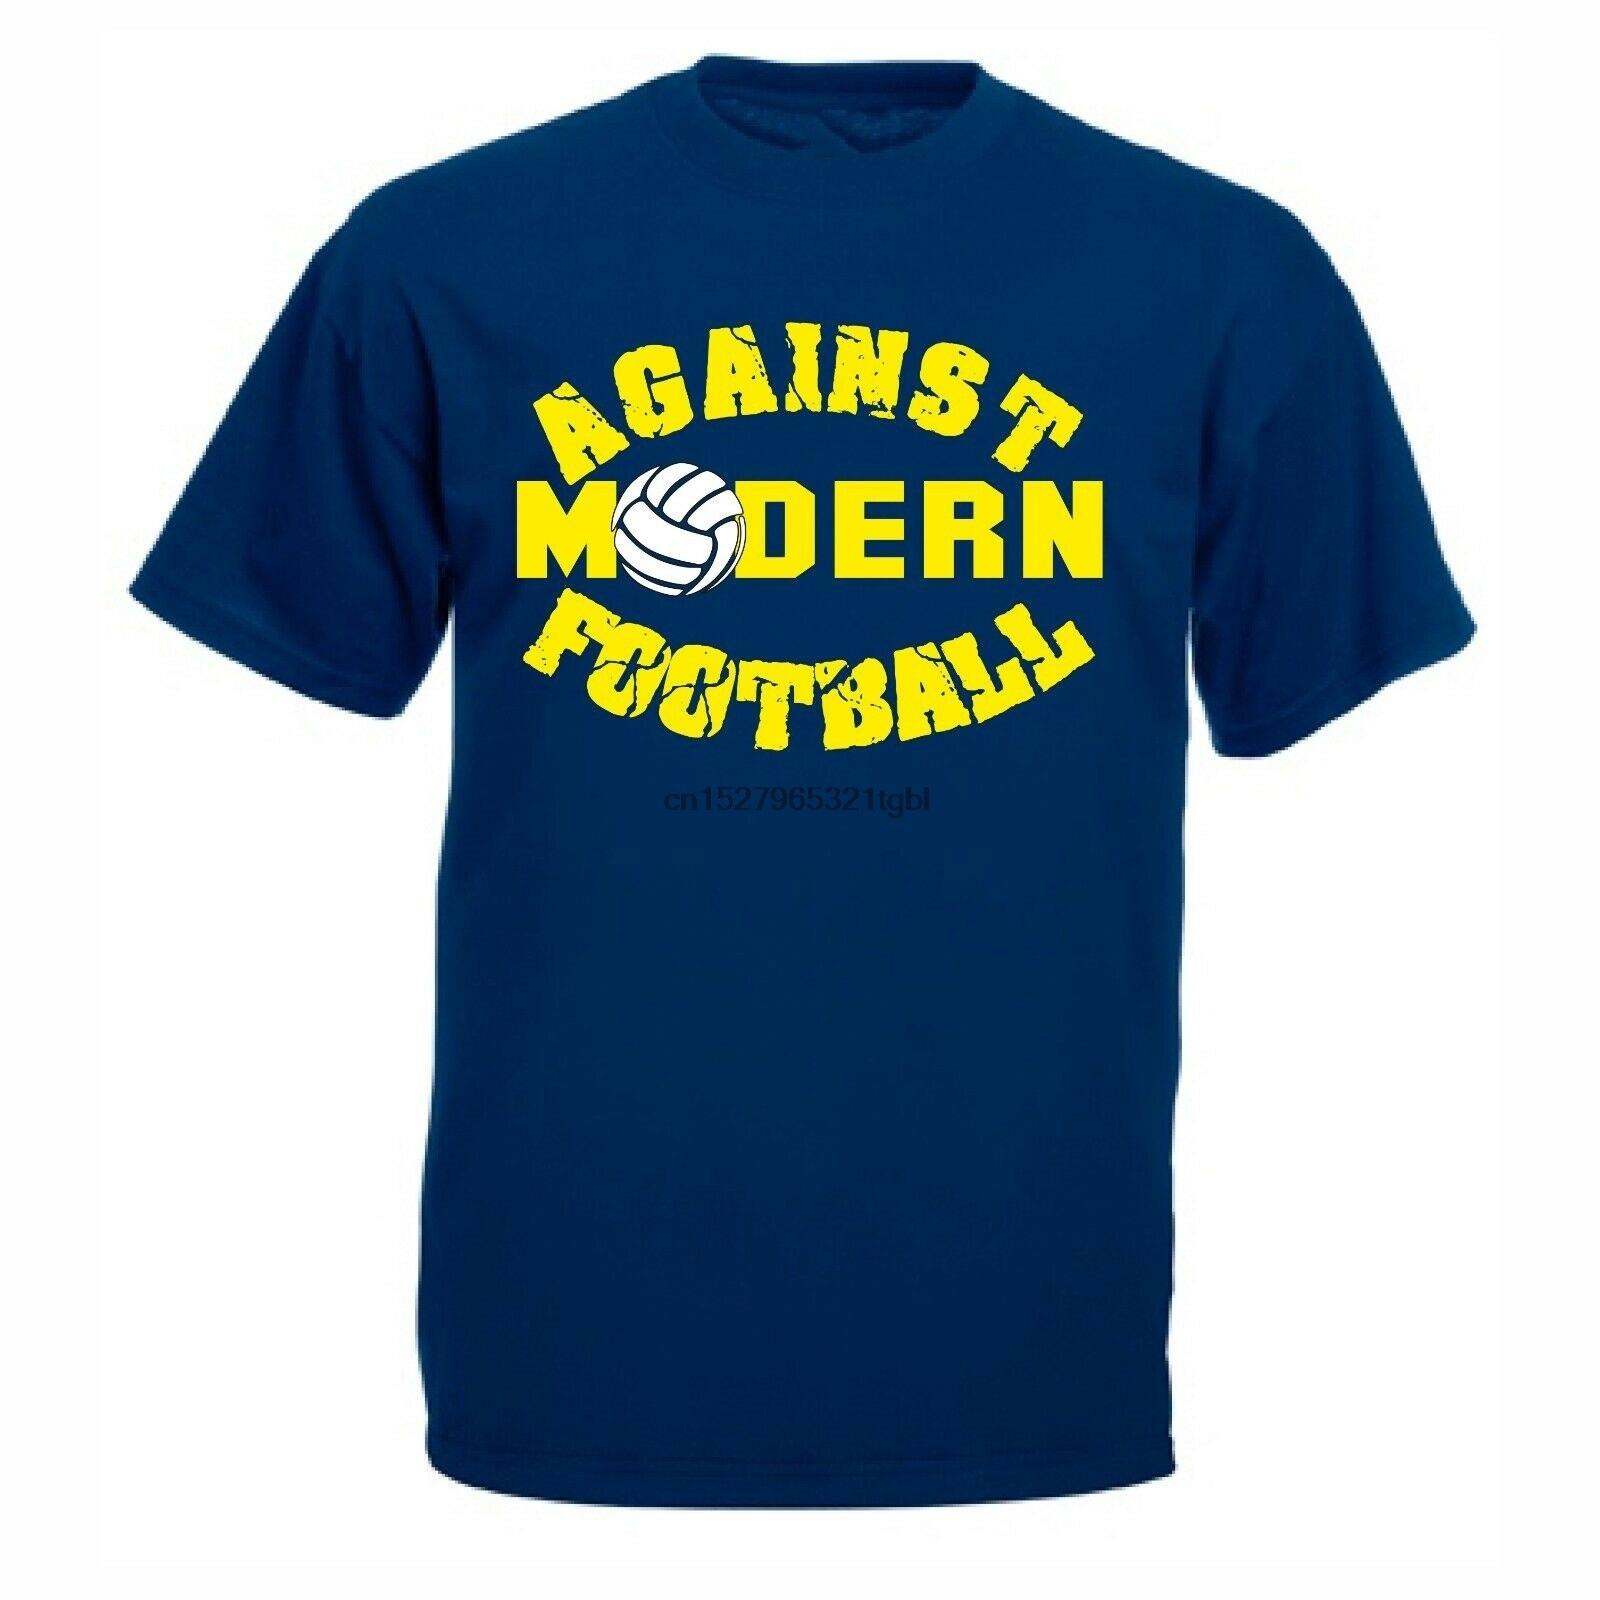 Camiseta de fútbol contra el fútbol moderno, conjunto de seguidor de Ultra terraza, ropa de calle para hombre, camisetas casuales graciosas clásicas a la moda